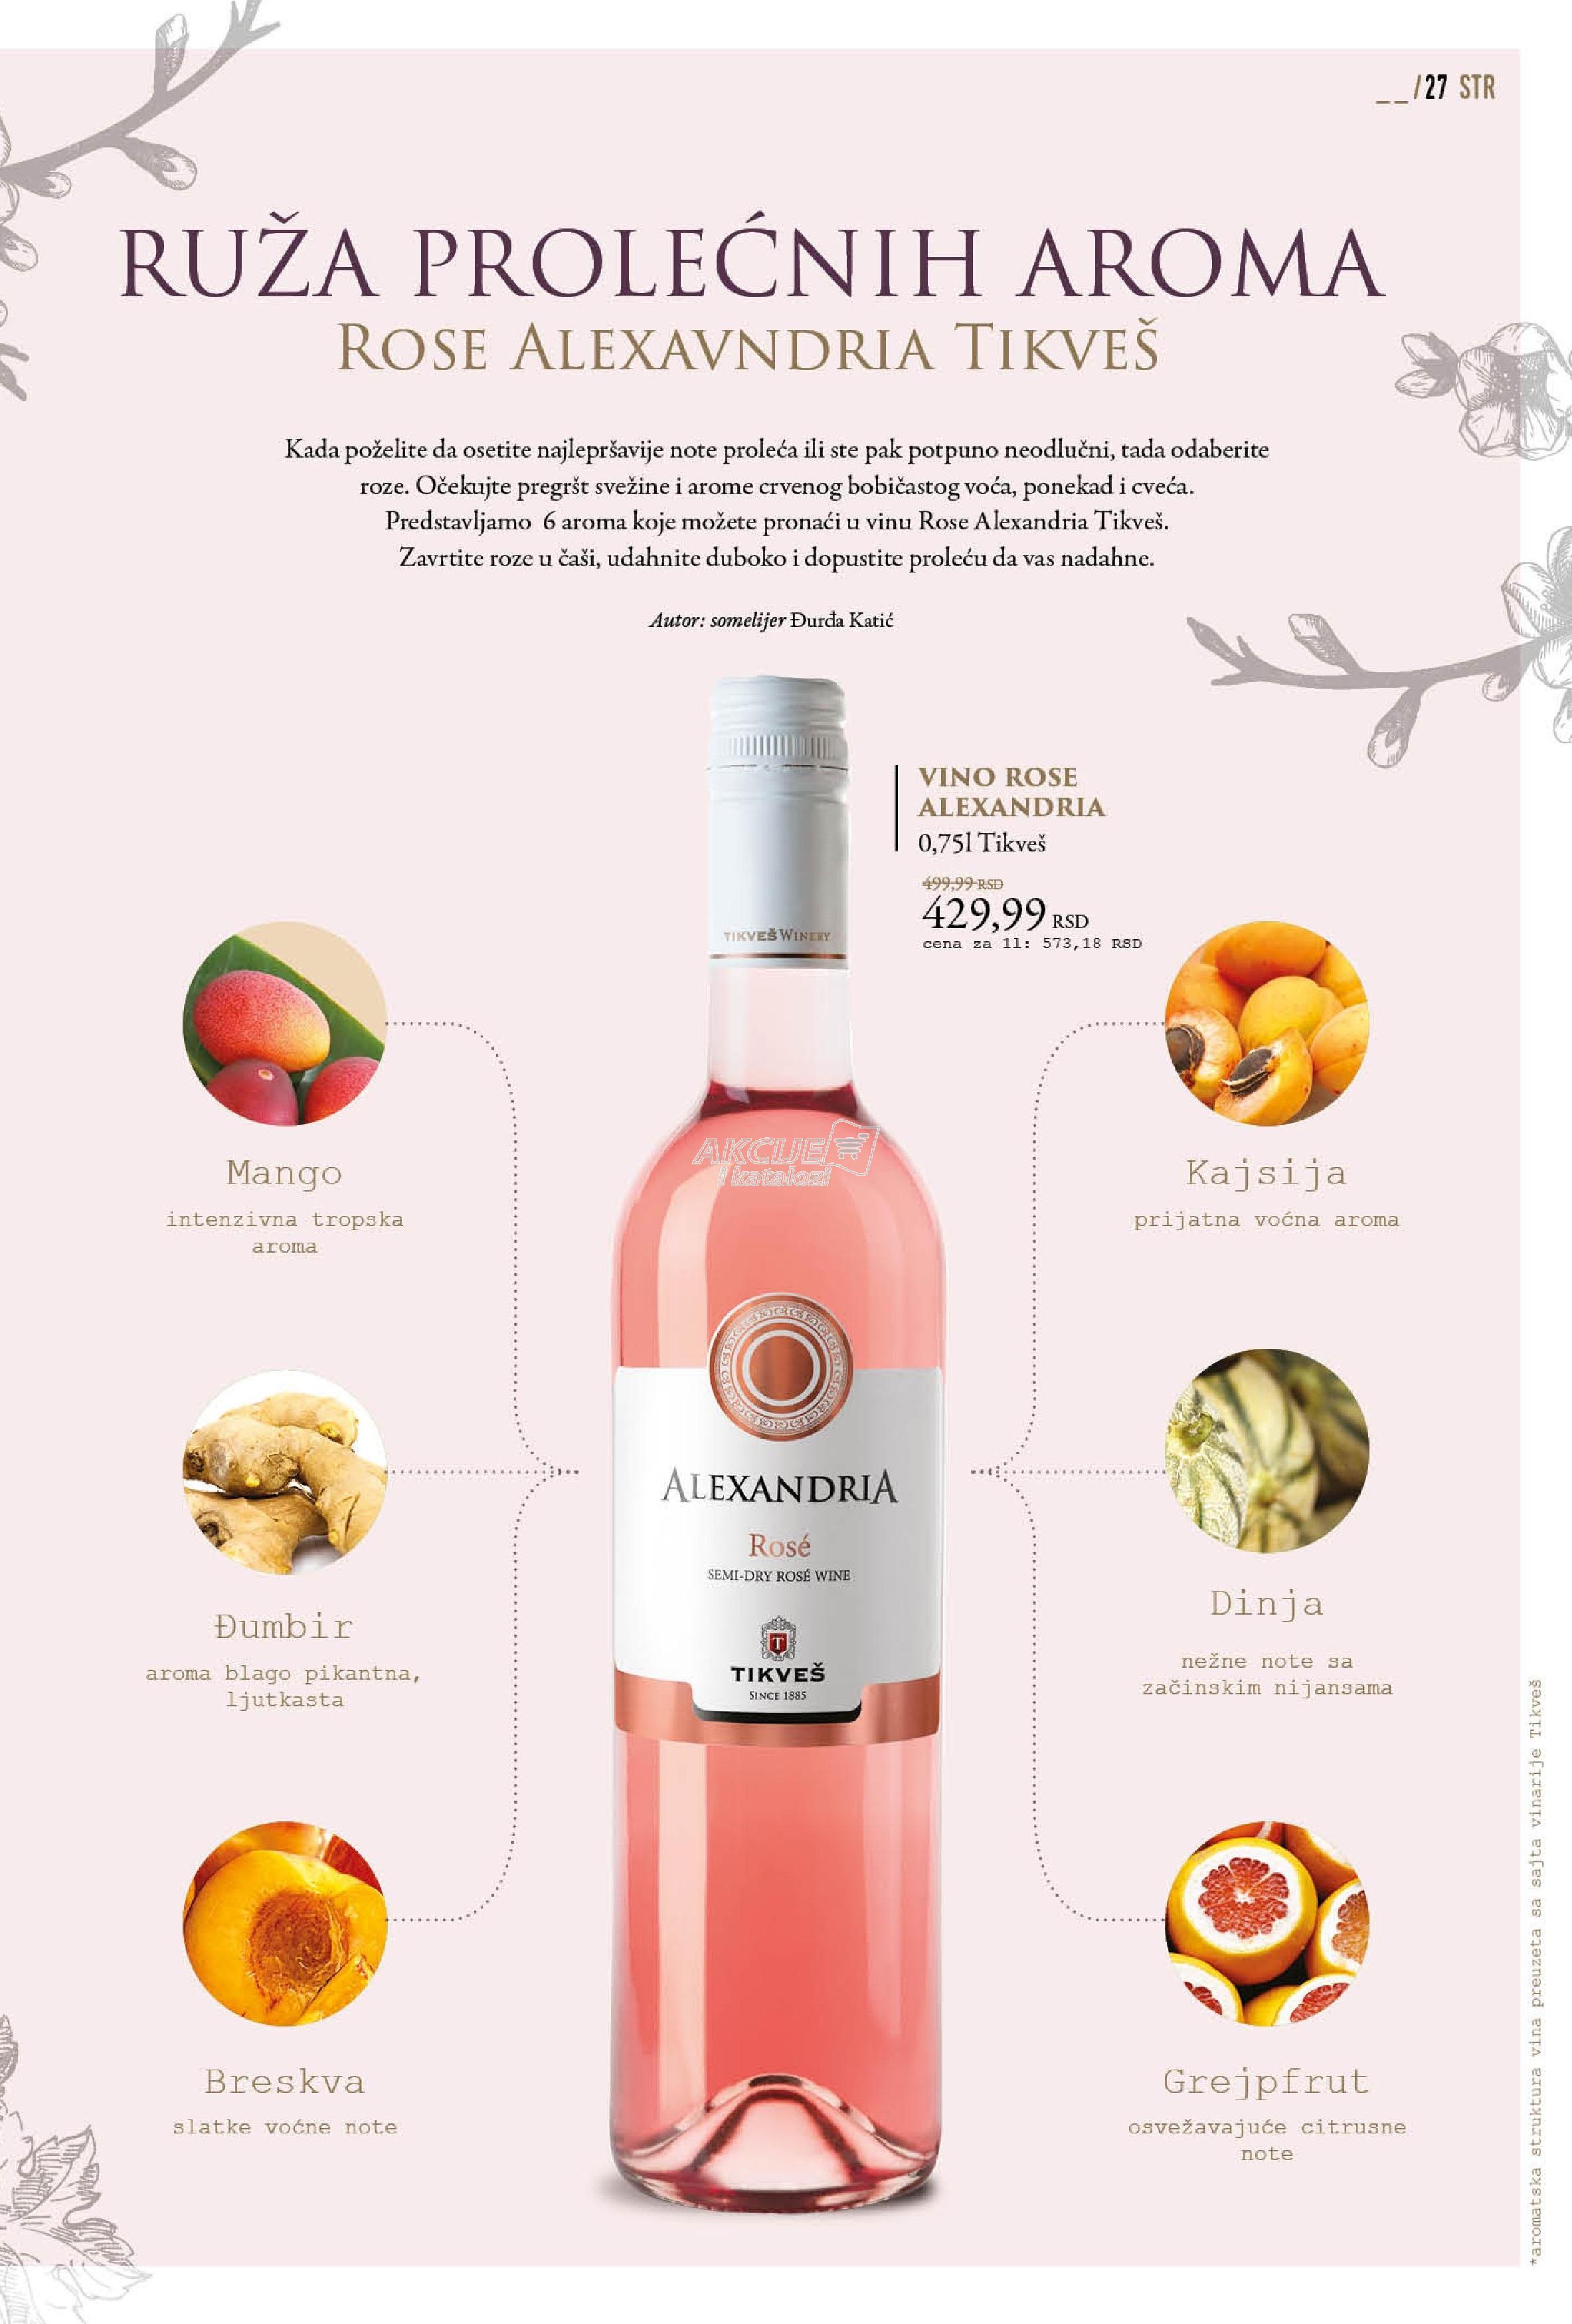 Roda akcija super cene vina